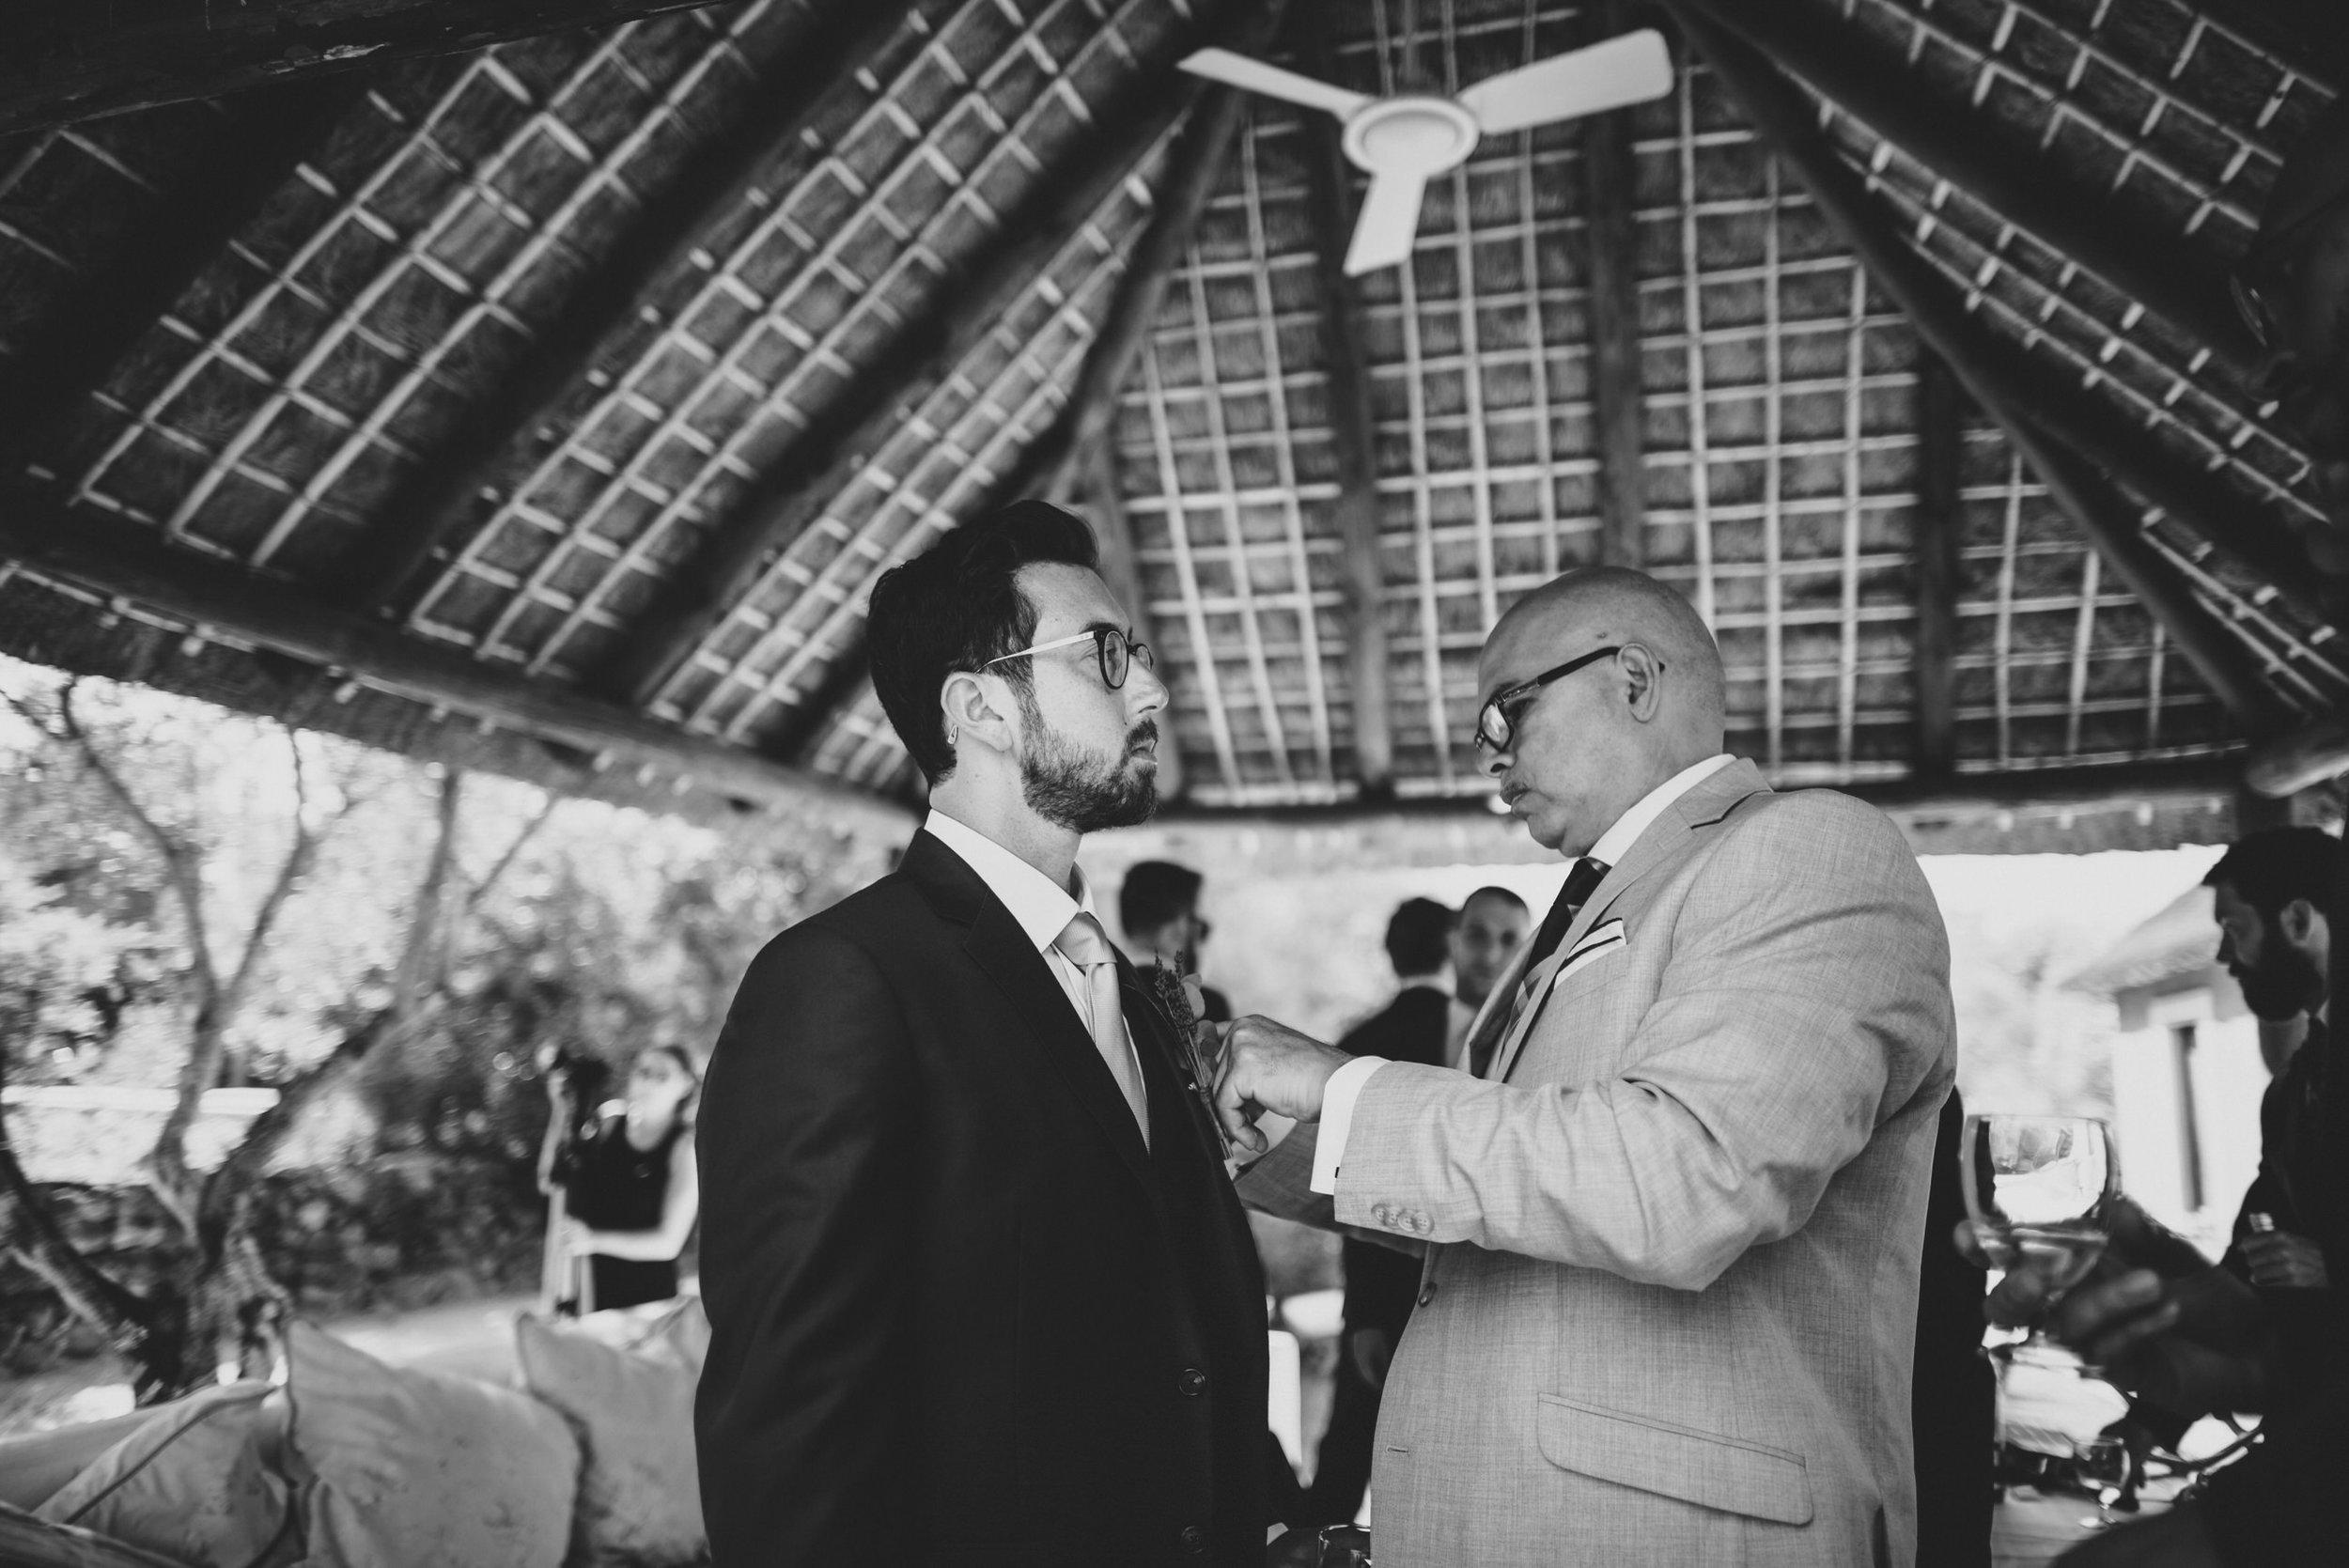 Andres+Amarillo+fotografo+boda+sevilla+natural+sin+poses+hacienda+san+rafael (30).JPG